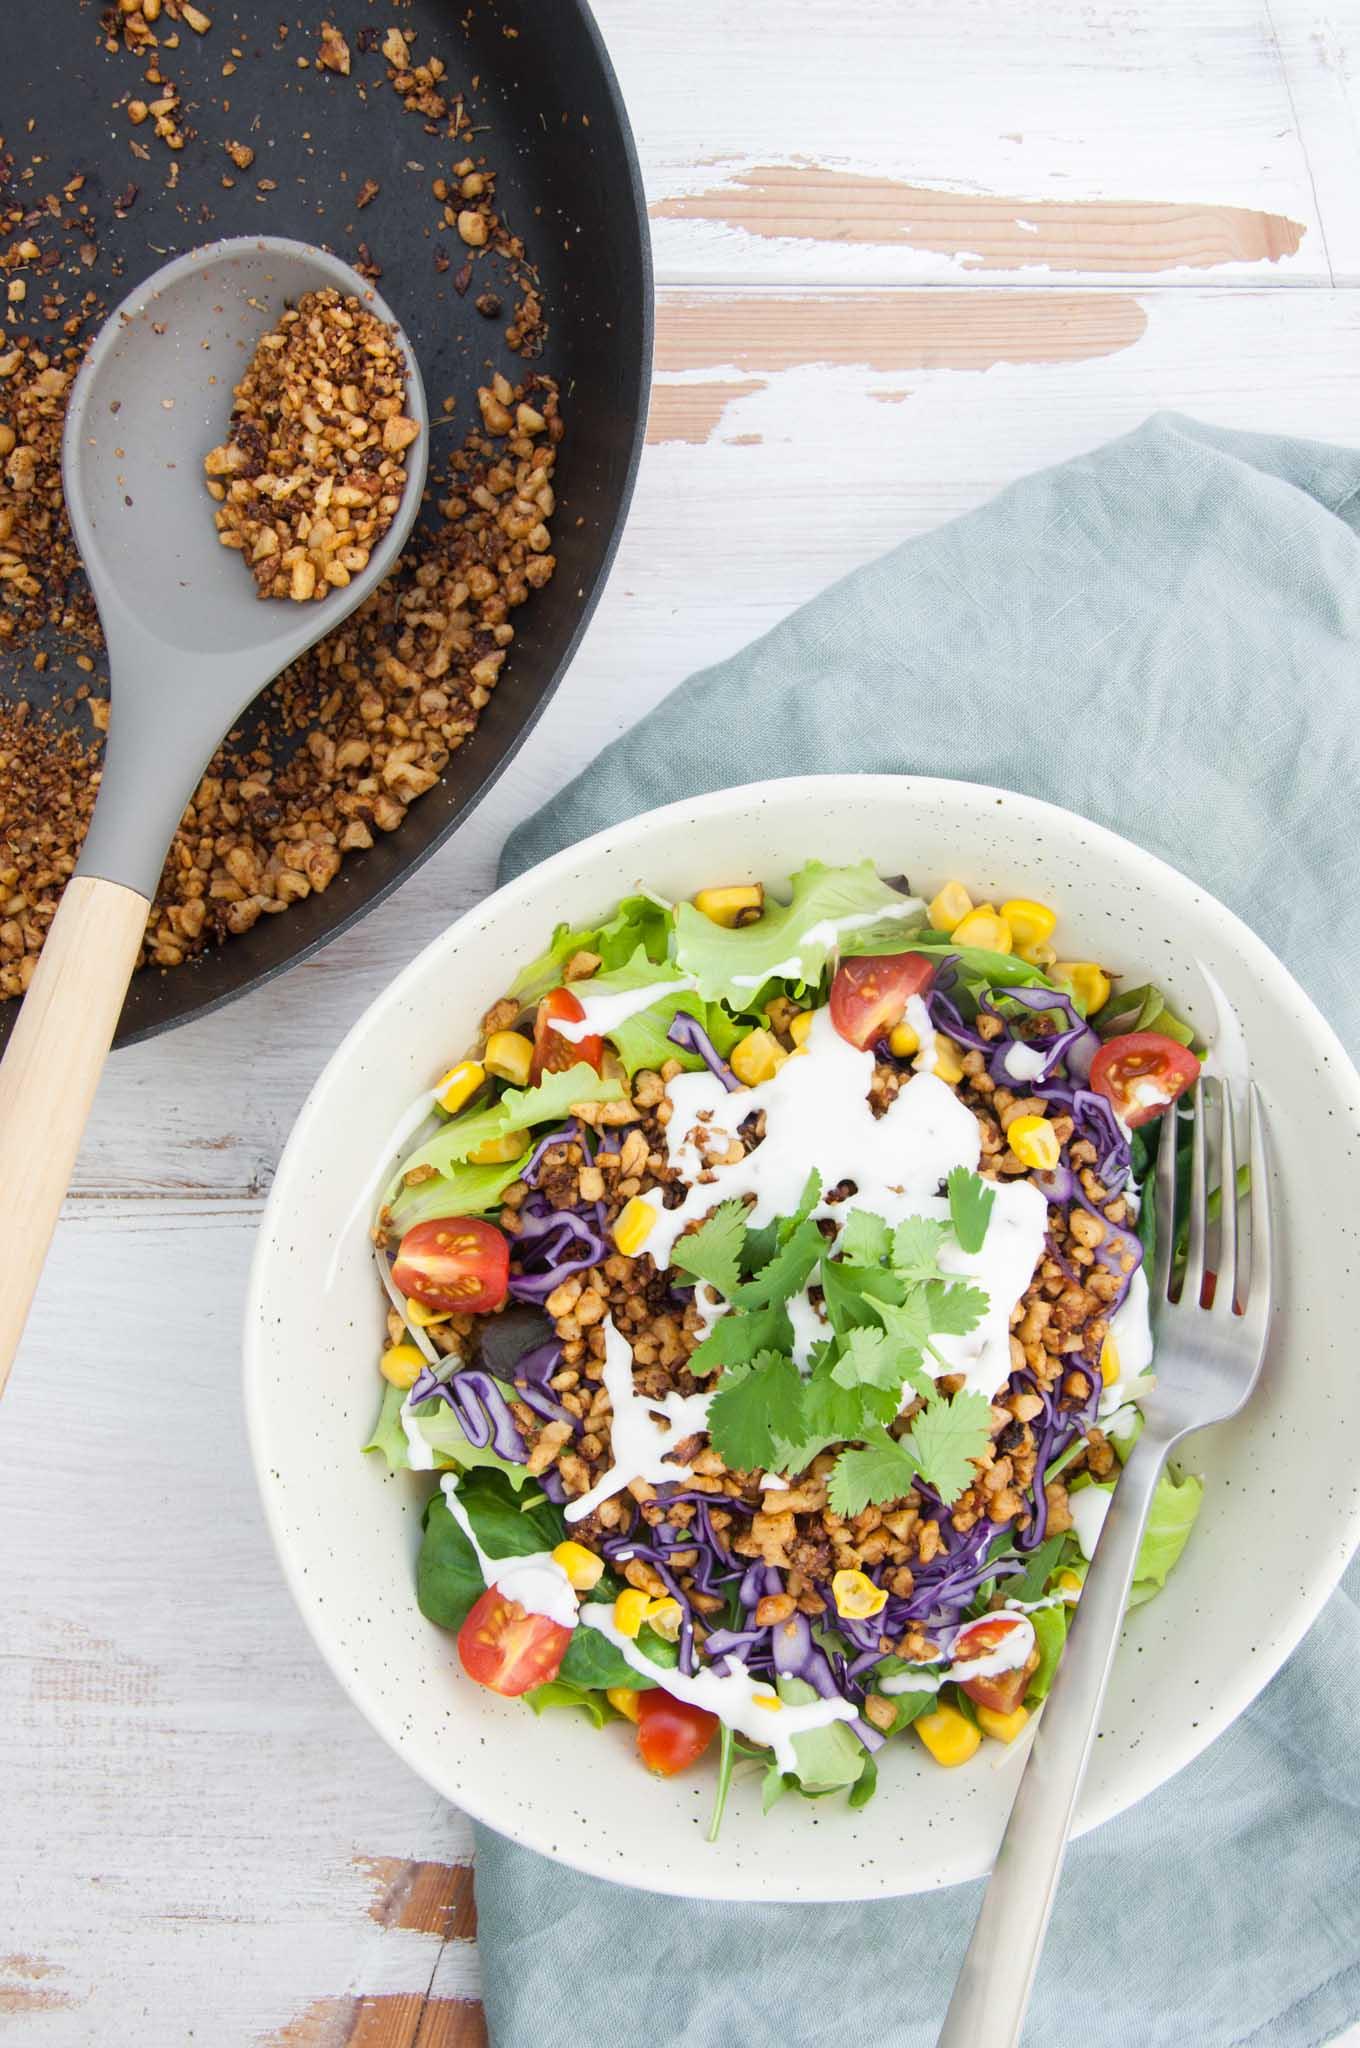 Vegan Taco Salad with Walnut Meat, corn, cabbage, tomatoes, vegan mayo and cilantro